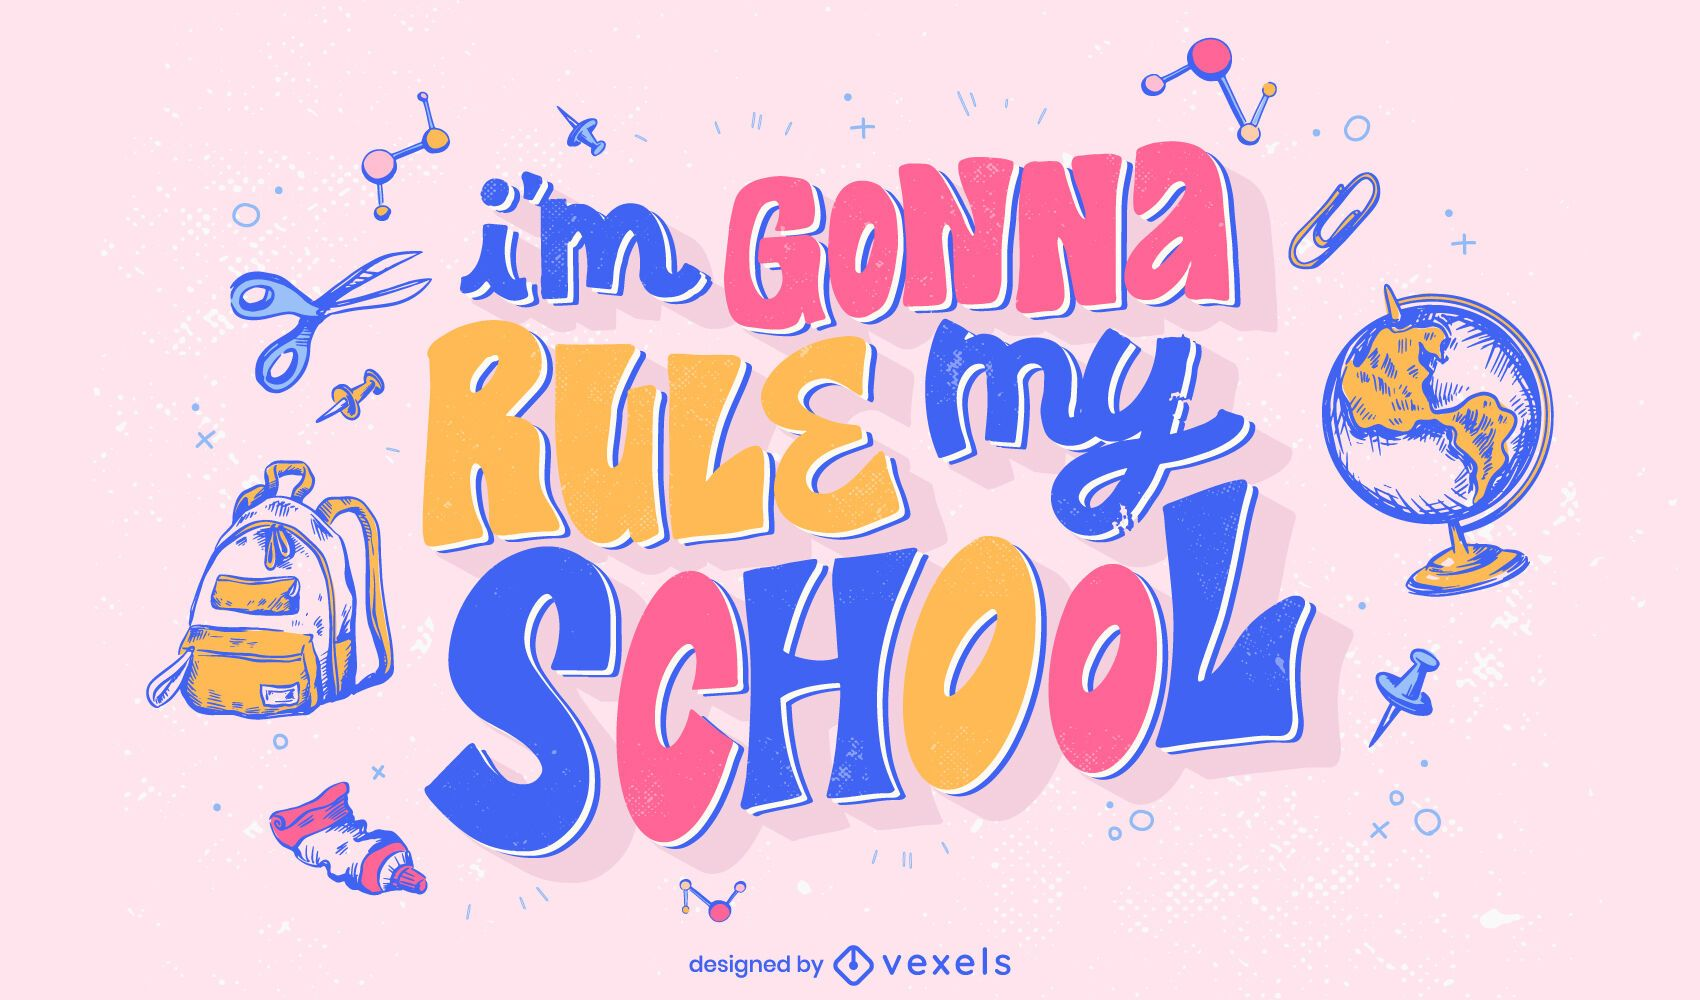 Diseño de letras coloridas de cita escolar